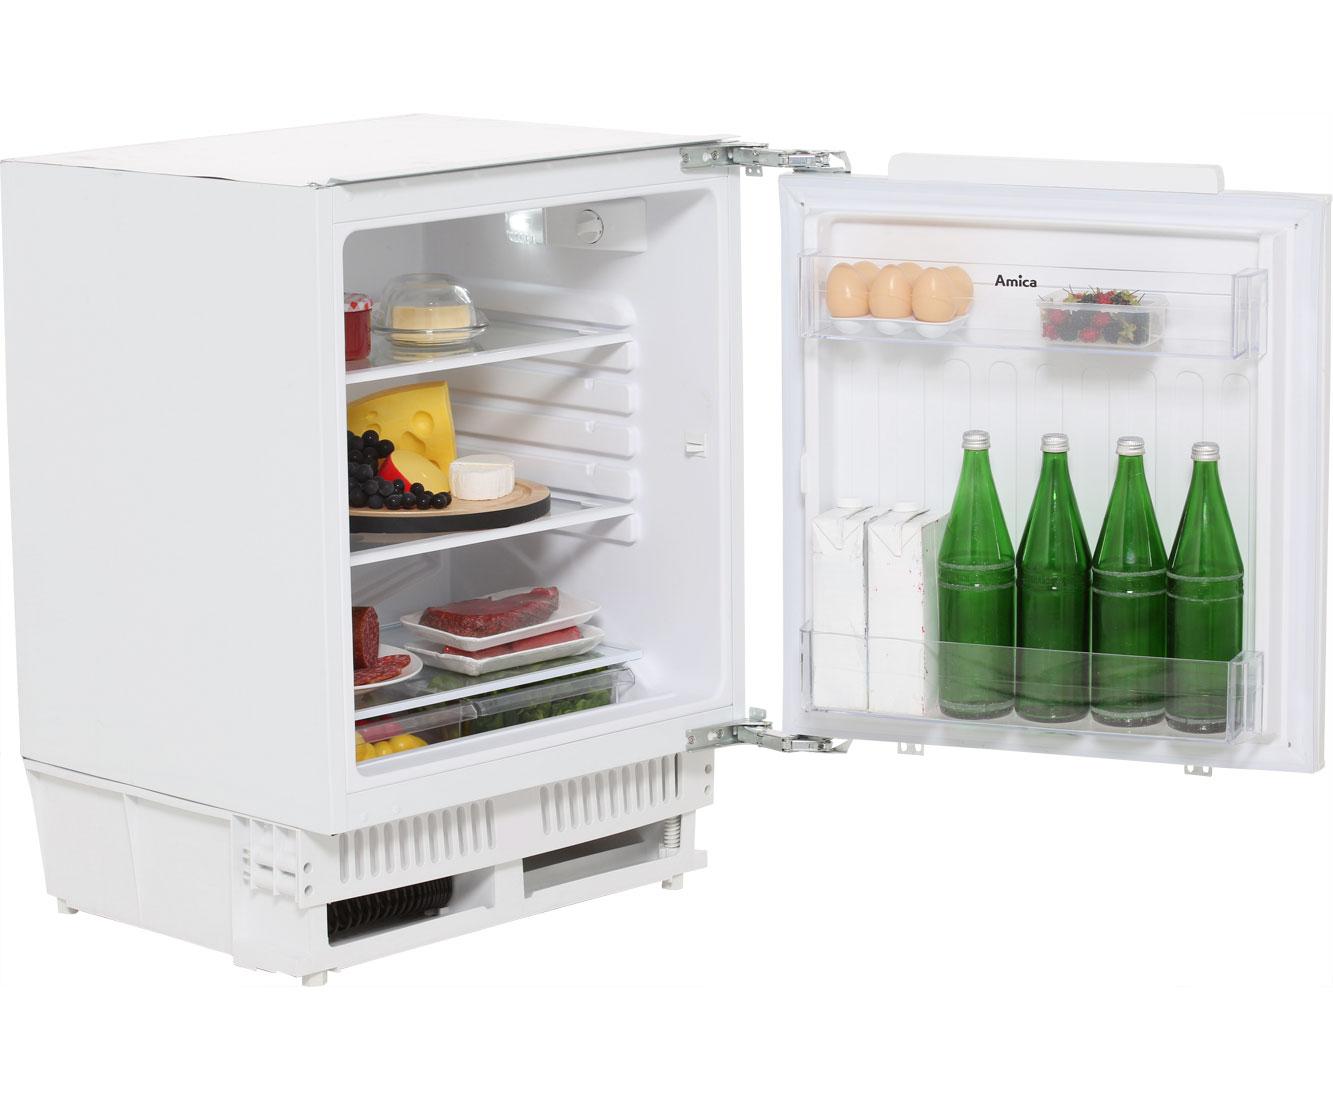 Amica Kühlschrank Hersteller : Rabatt preisvergleich.de haushalt u003e großgeräte u003e kühlschränke